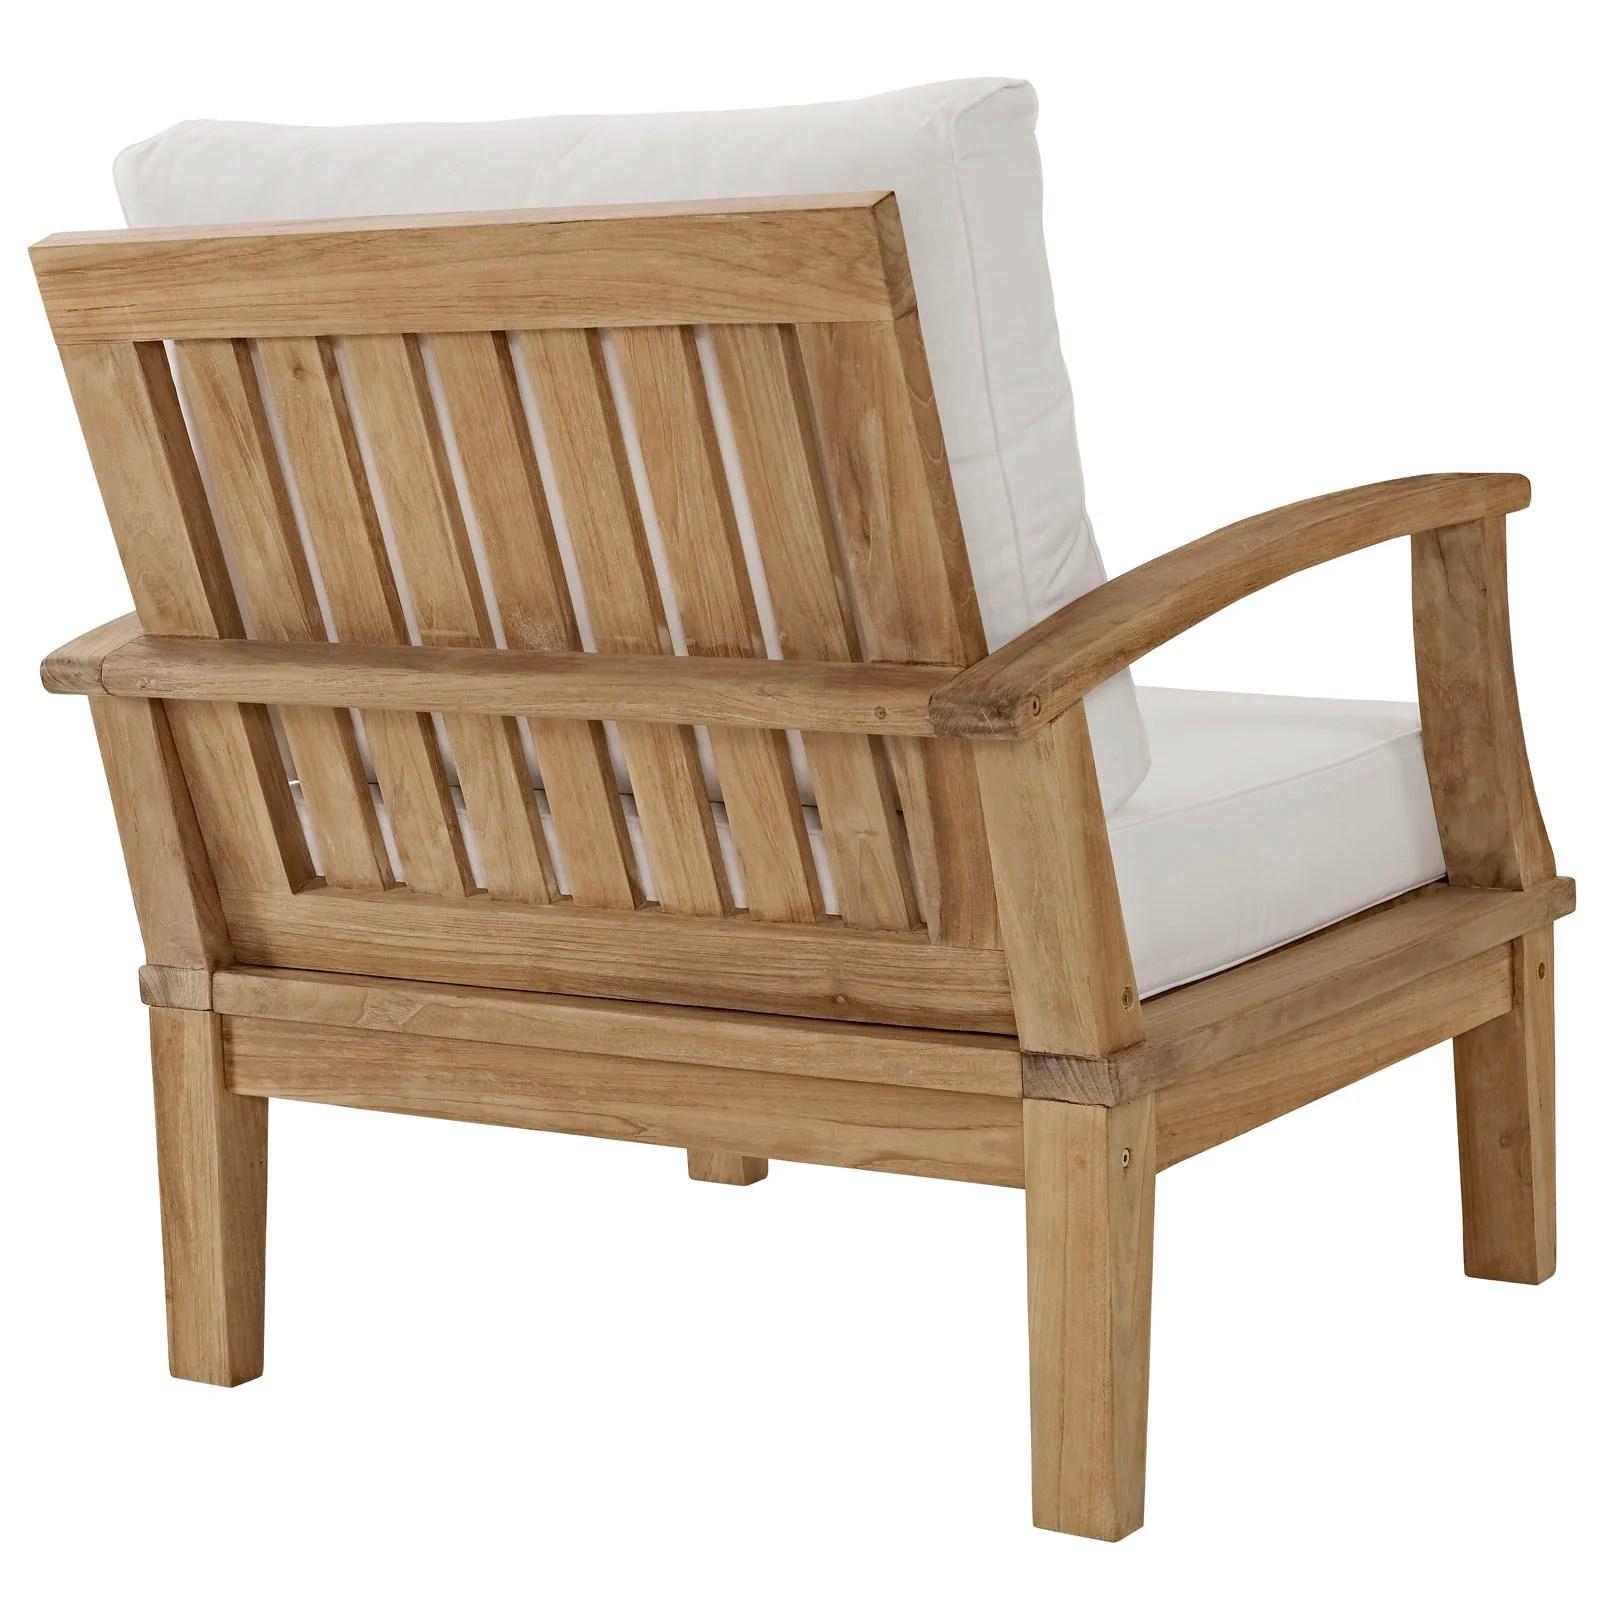 1 piece patio chair cushions black plastic with wooden legs modway marina teak 4 lounge set